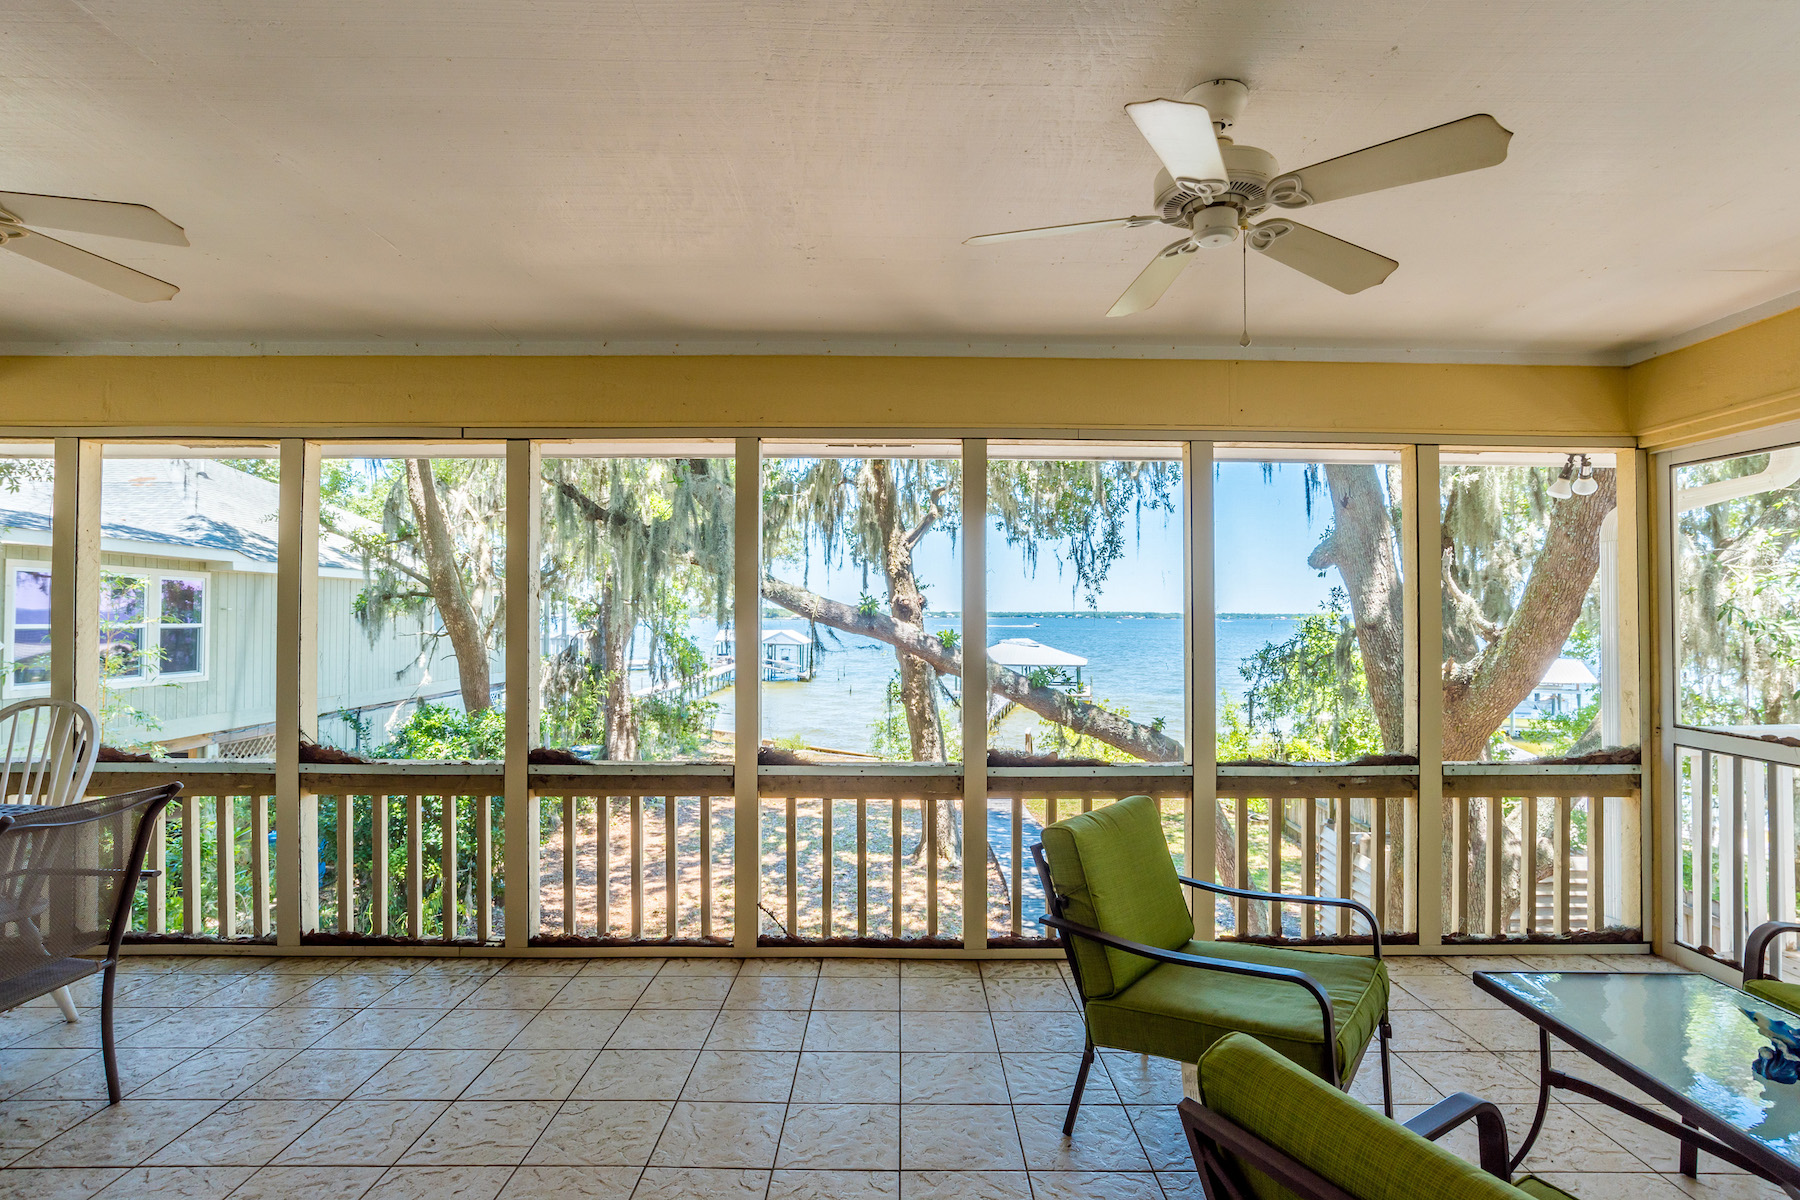 واحد منزل الأسرة للـ Sale في Bayland House 29923 Bayland Drive, Orange Beach, Alabama, 36561 United States